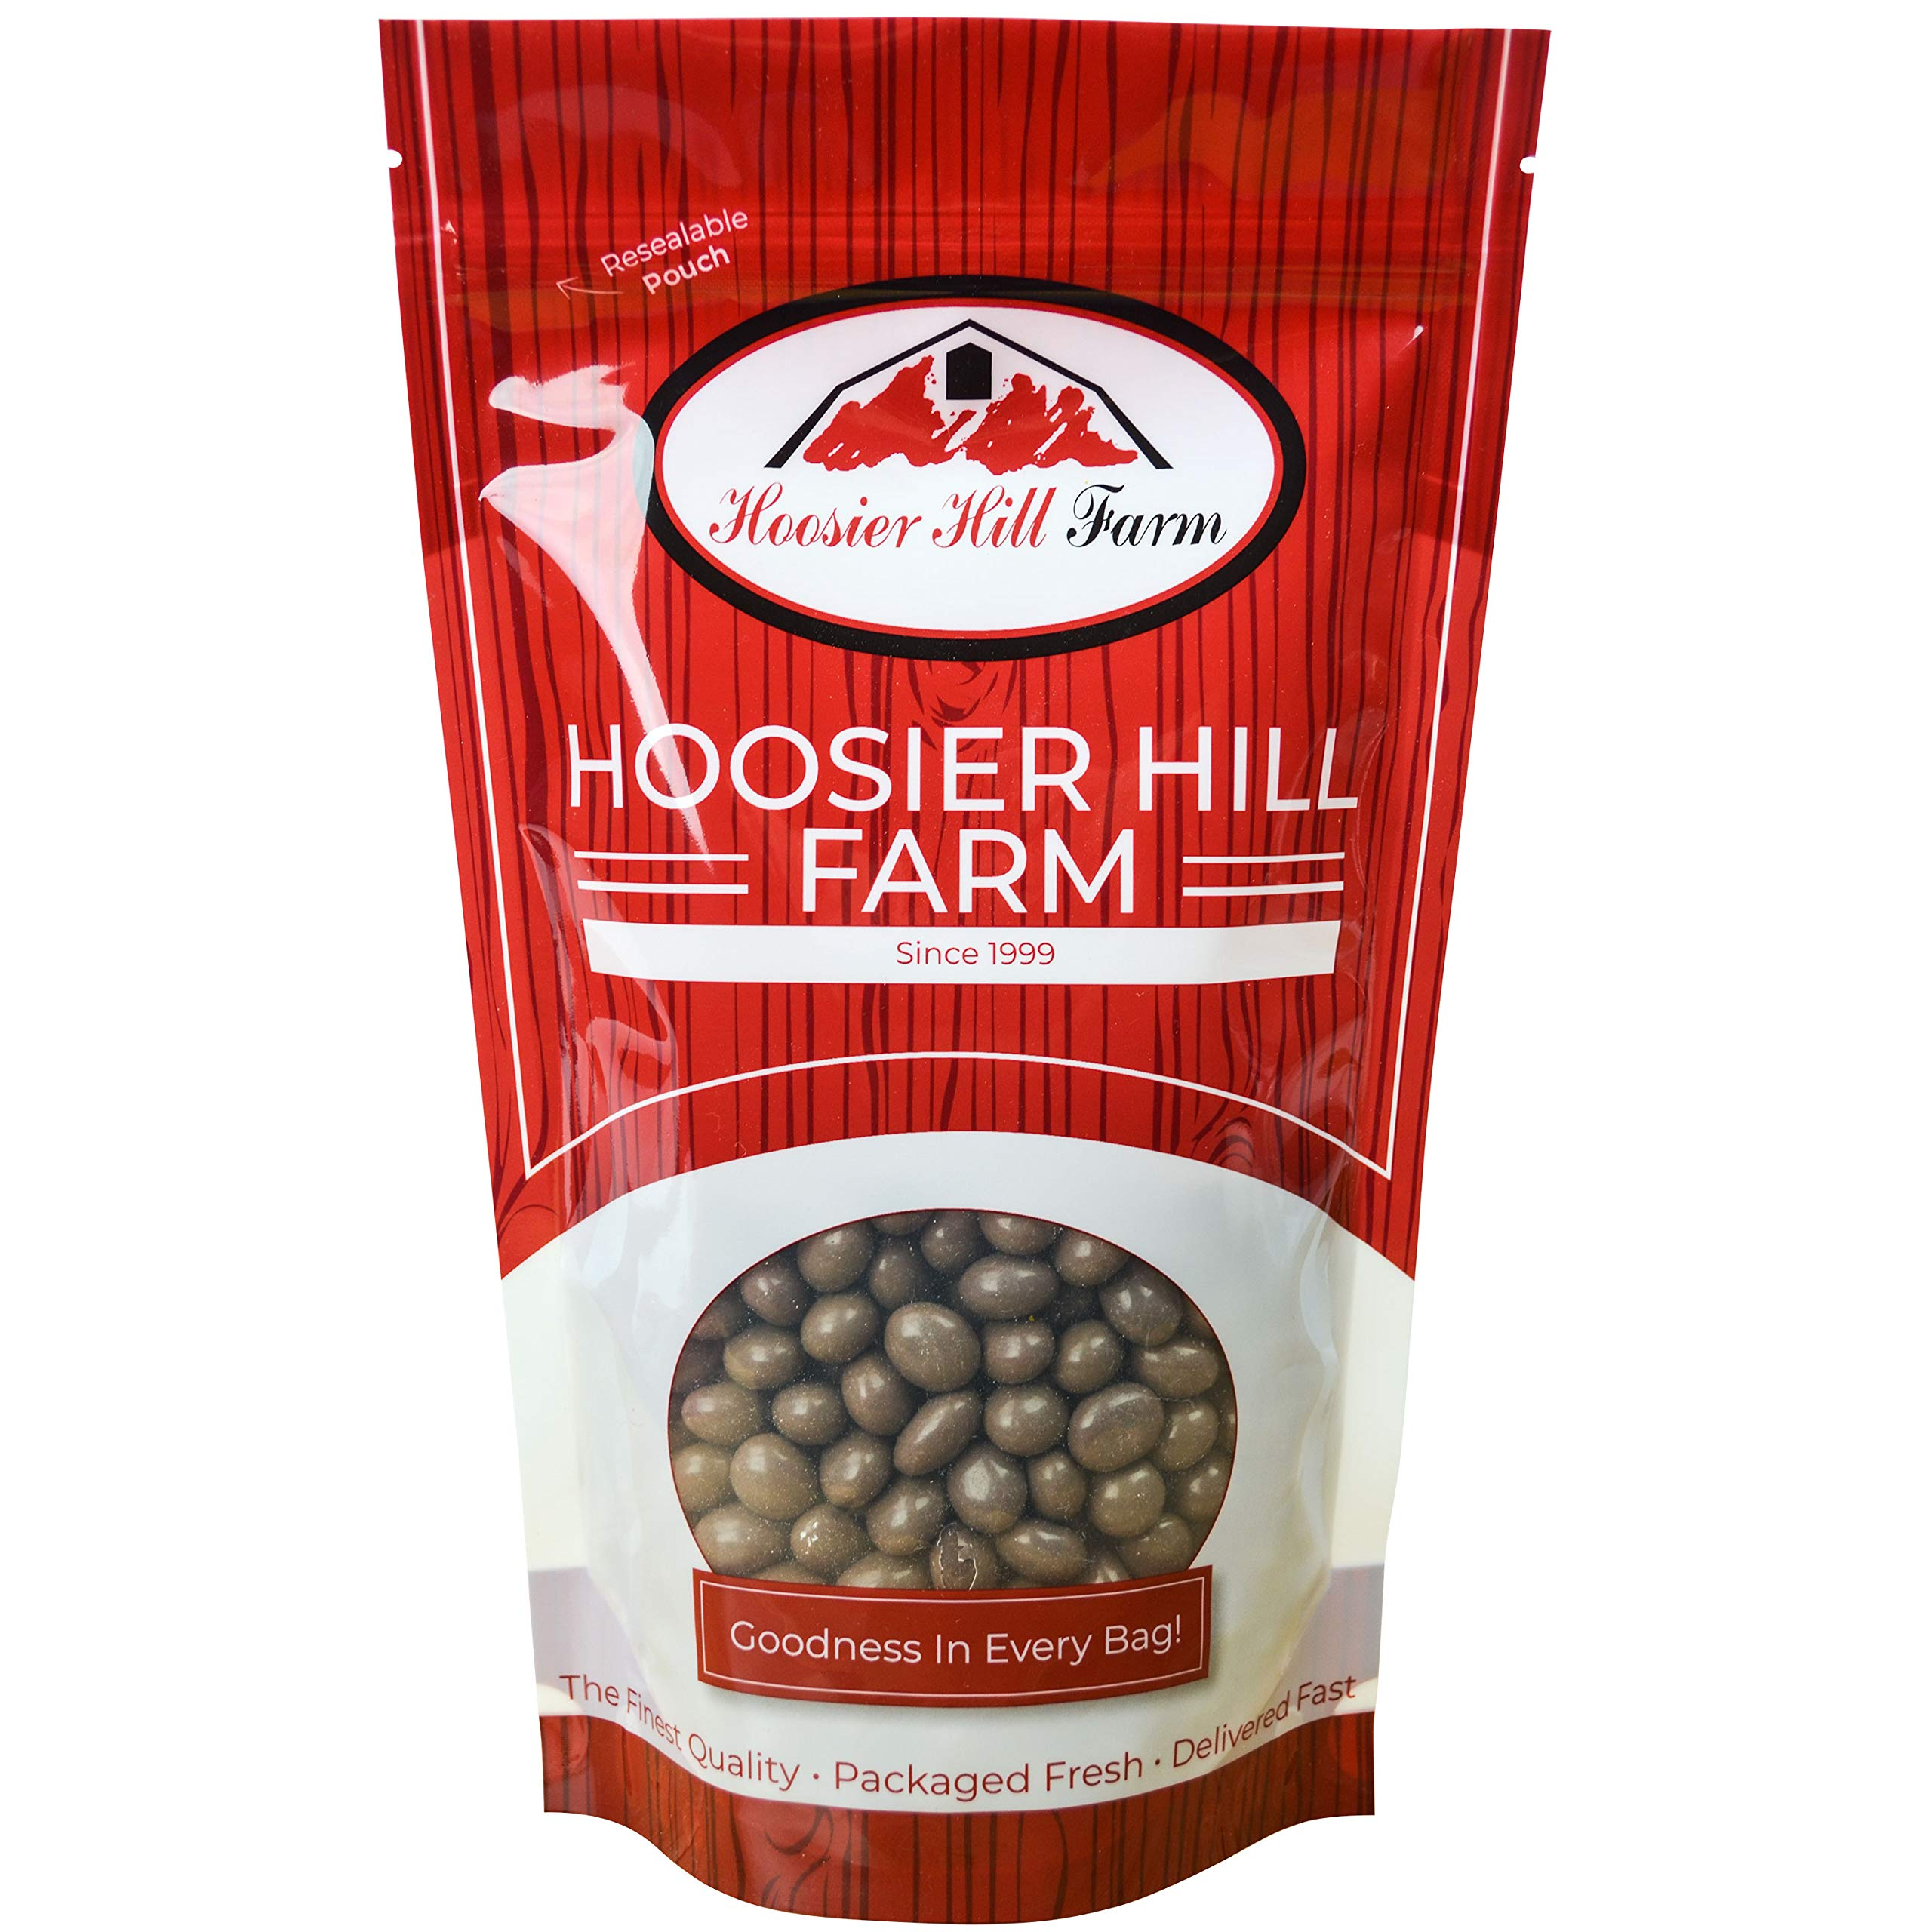 Gourmet Milk Chocolate covered Espresso Beans, Hoosier Hill Farm (2 lb Bag) by Hoosier Hill Farm